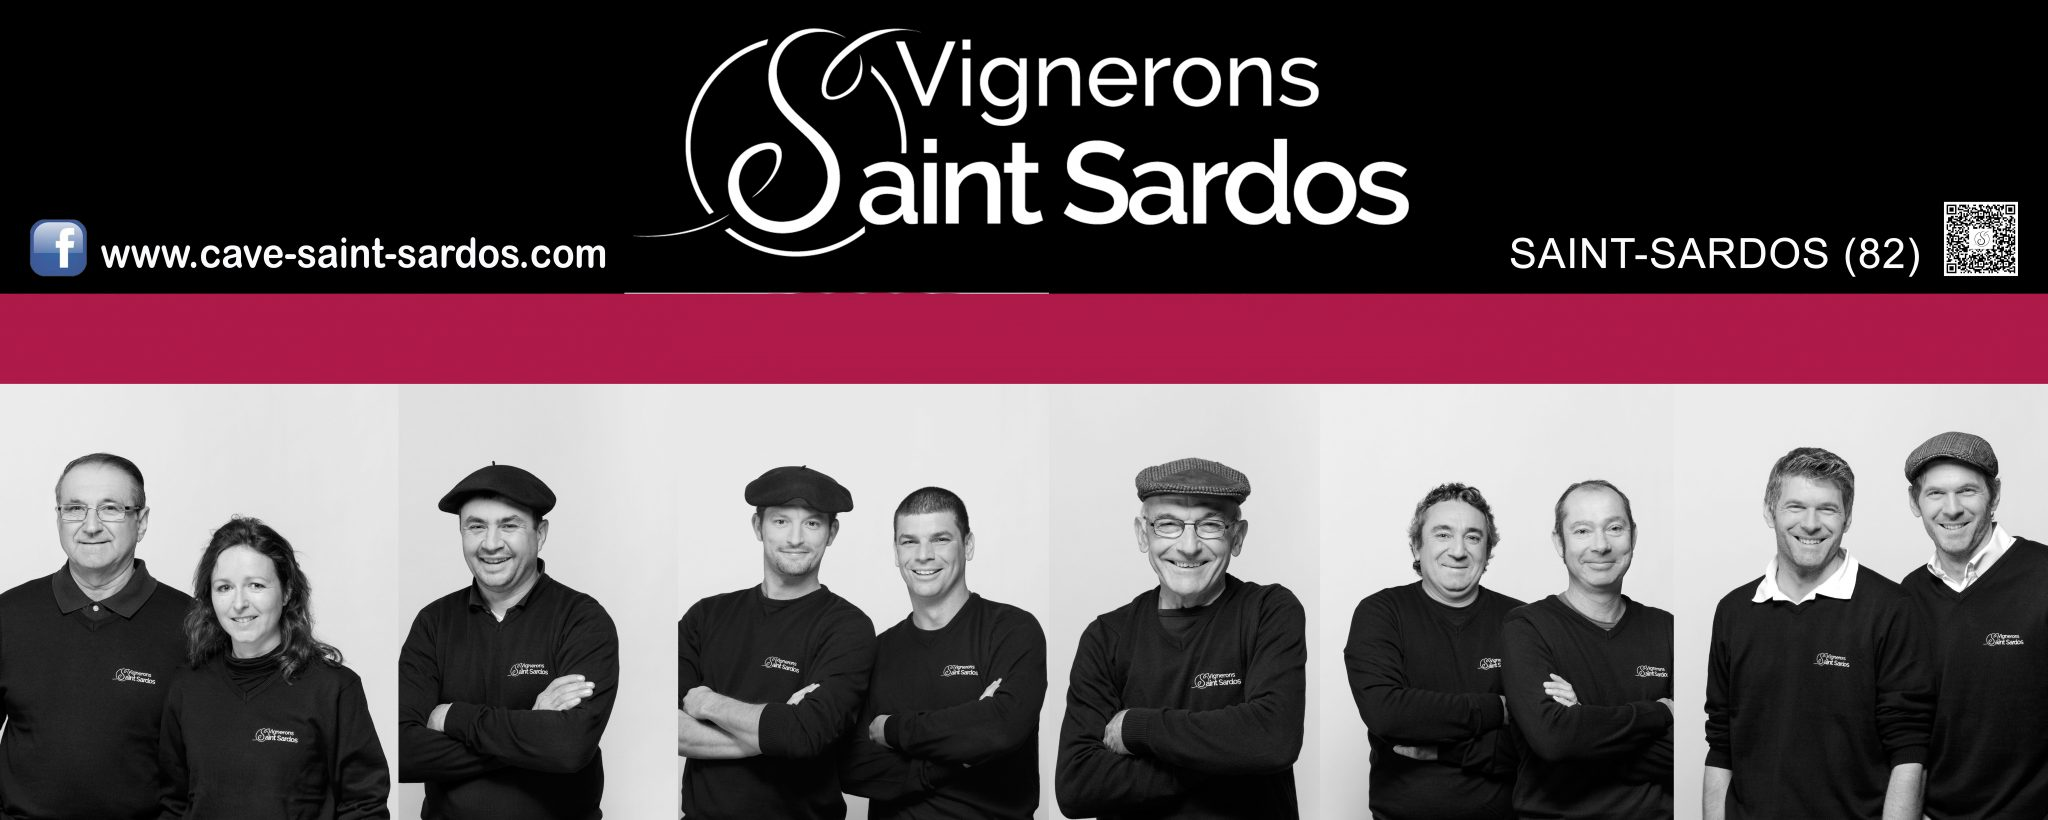 LES VIGNERONS DE SAINT-SARDOS